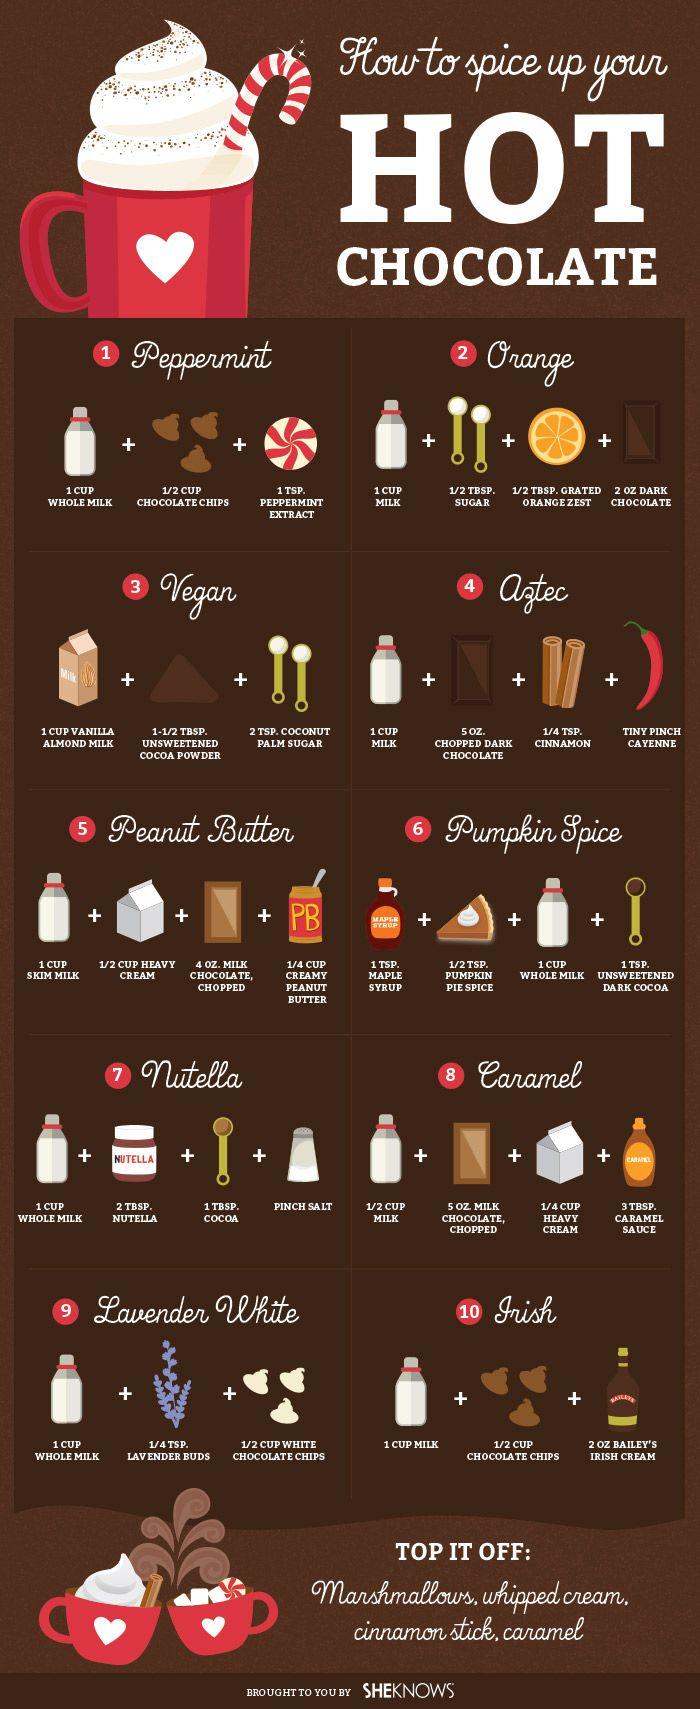 Hot cocoa variations